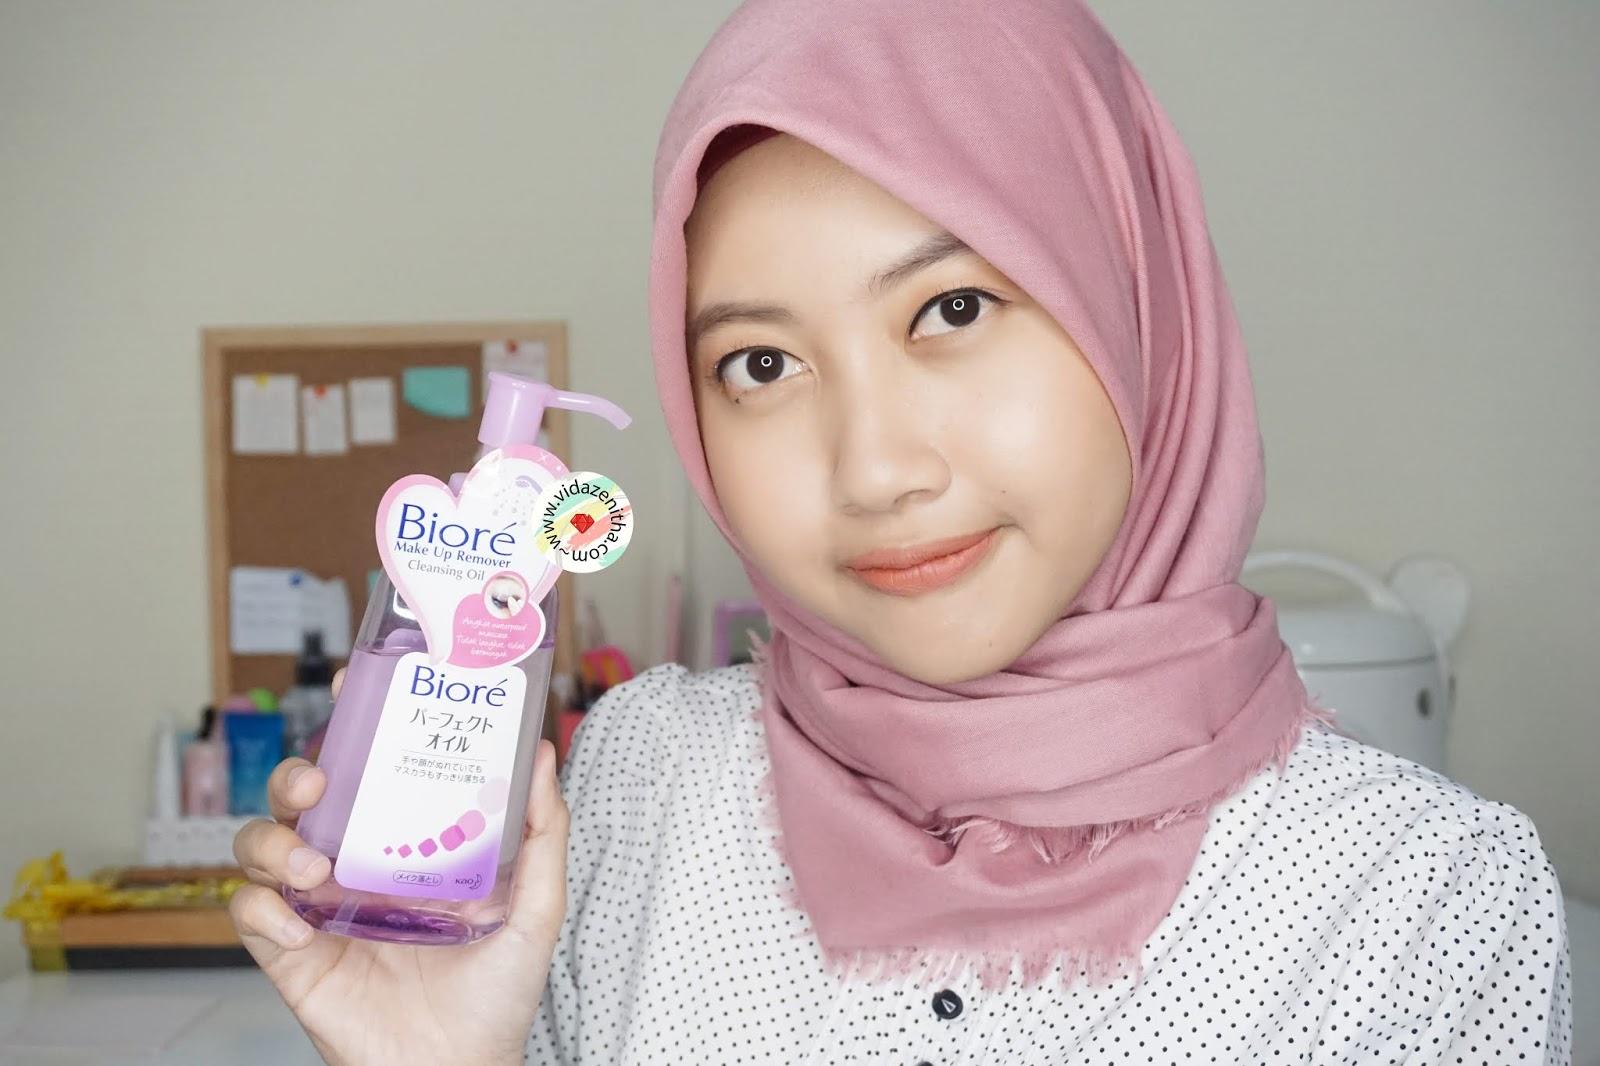 recommended cleansing oil dari biore